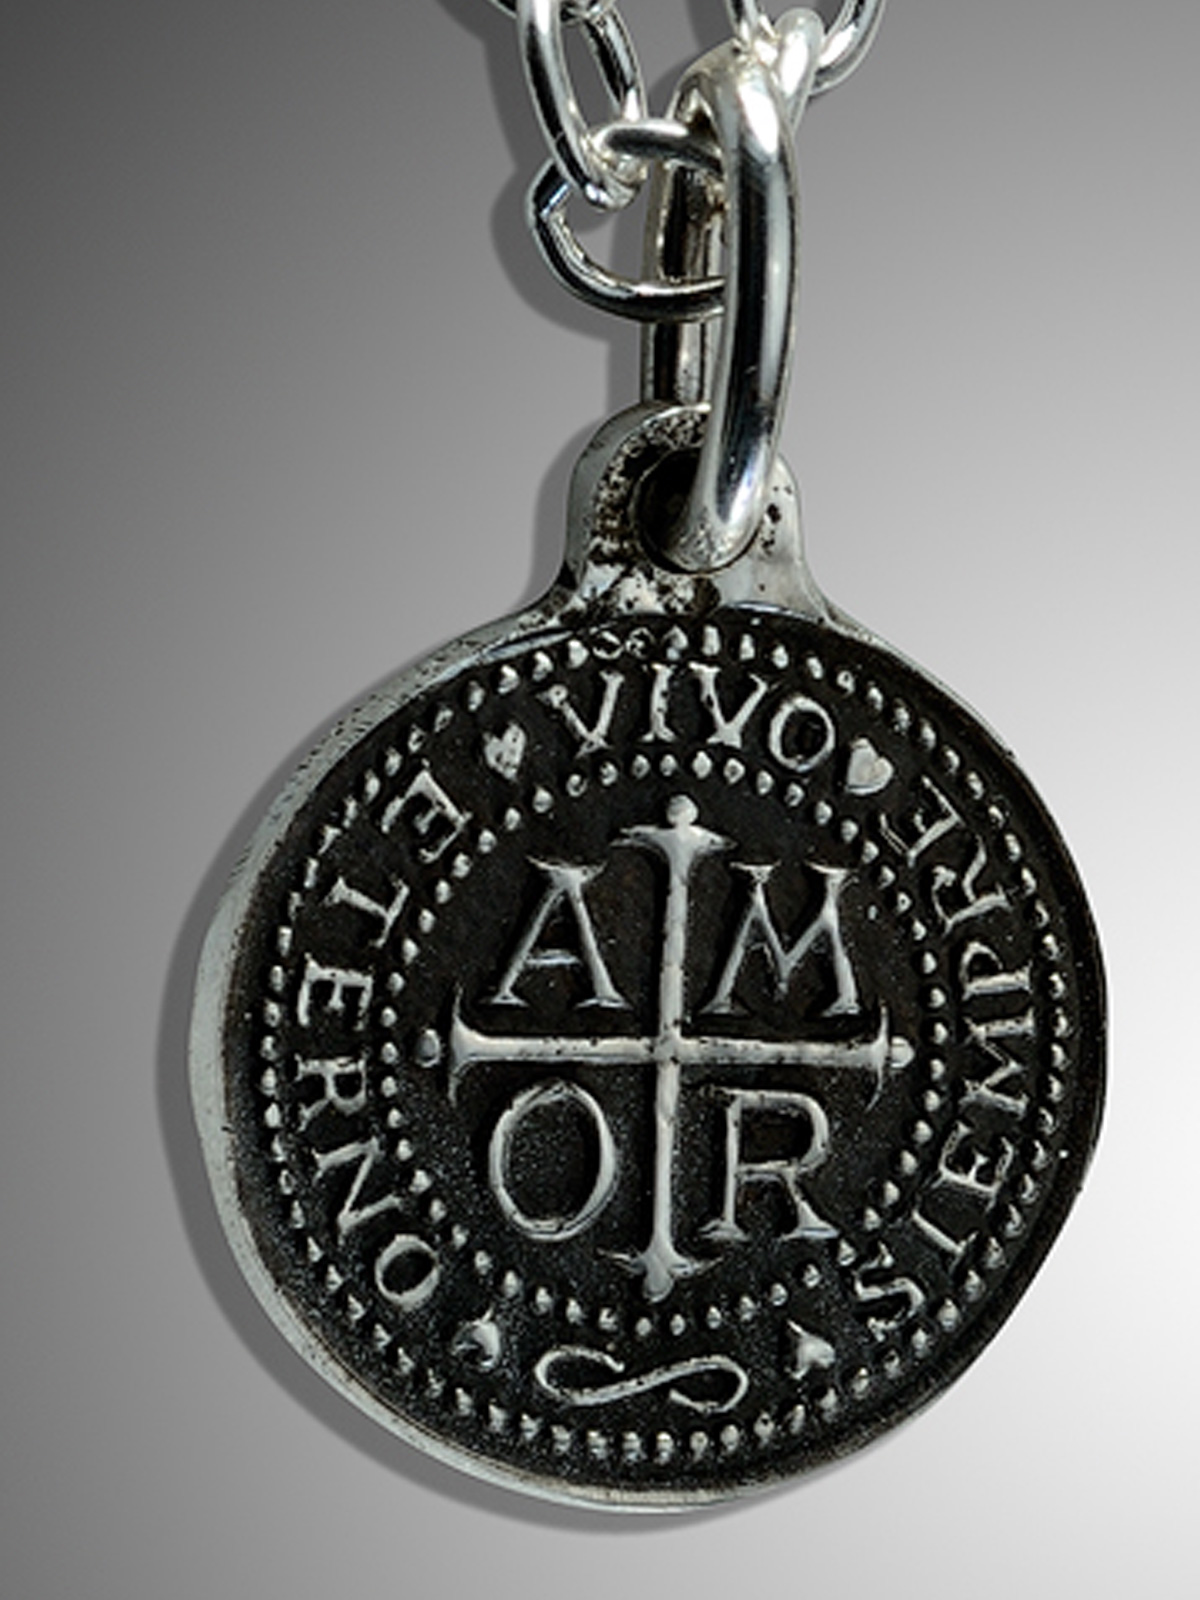 Silver amor charm pendant by santa fe artist douglas magnus oxidized sterling silver amor charm pendant silver amor aloadofball Image collections